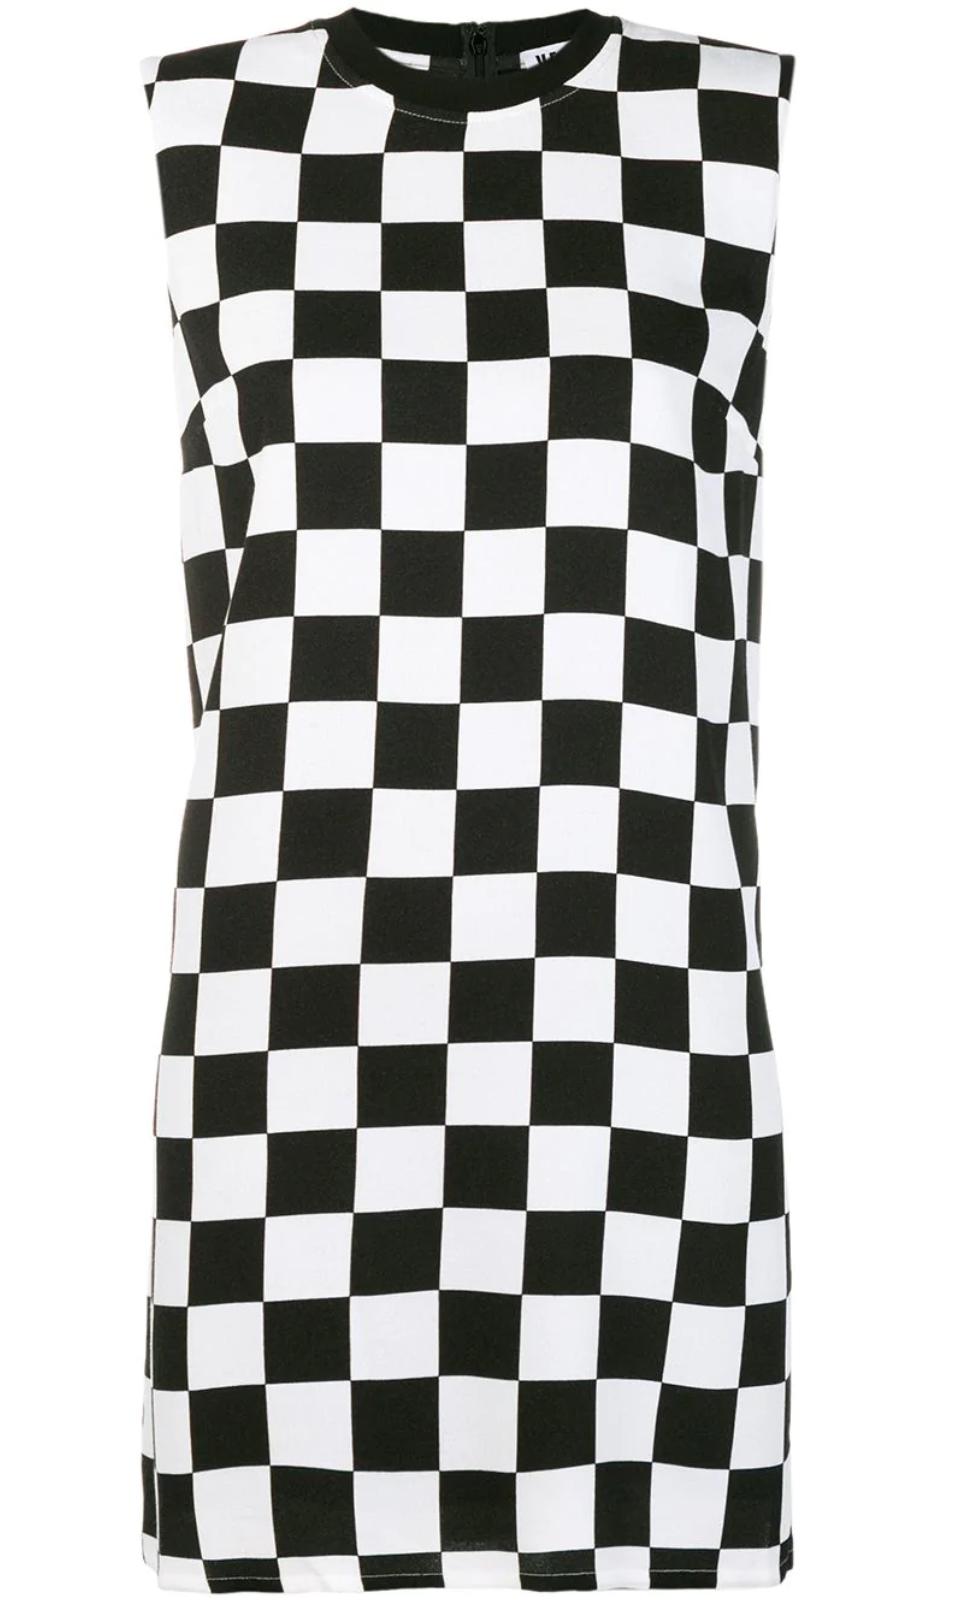 Flared Check Dress - Versus